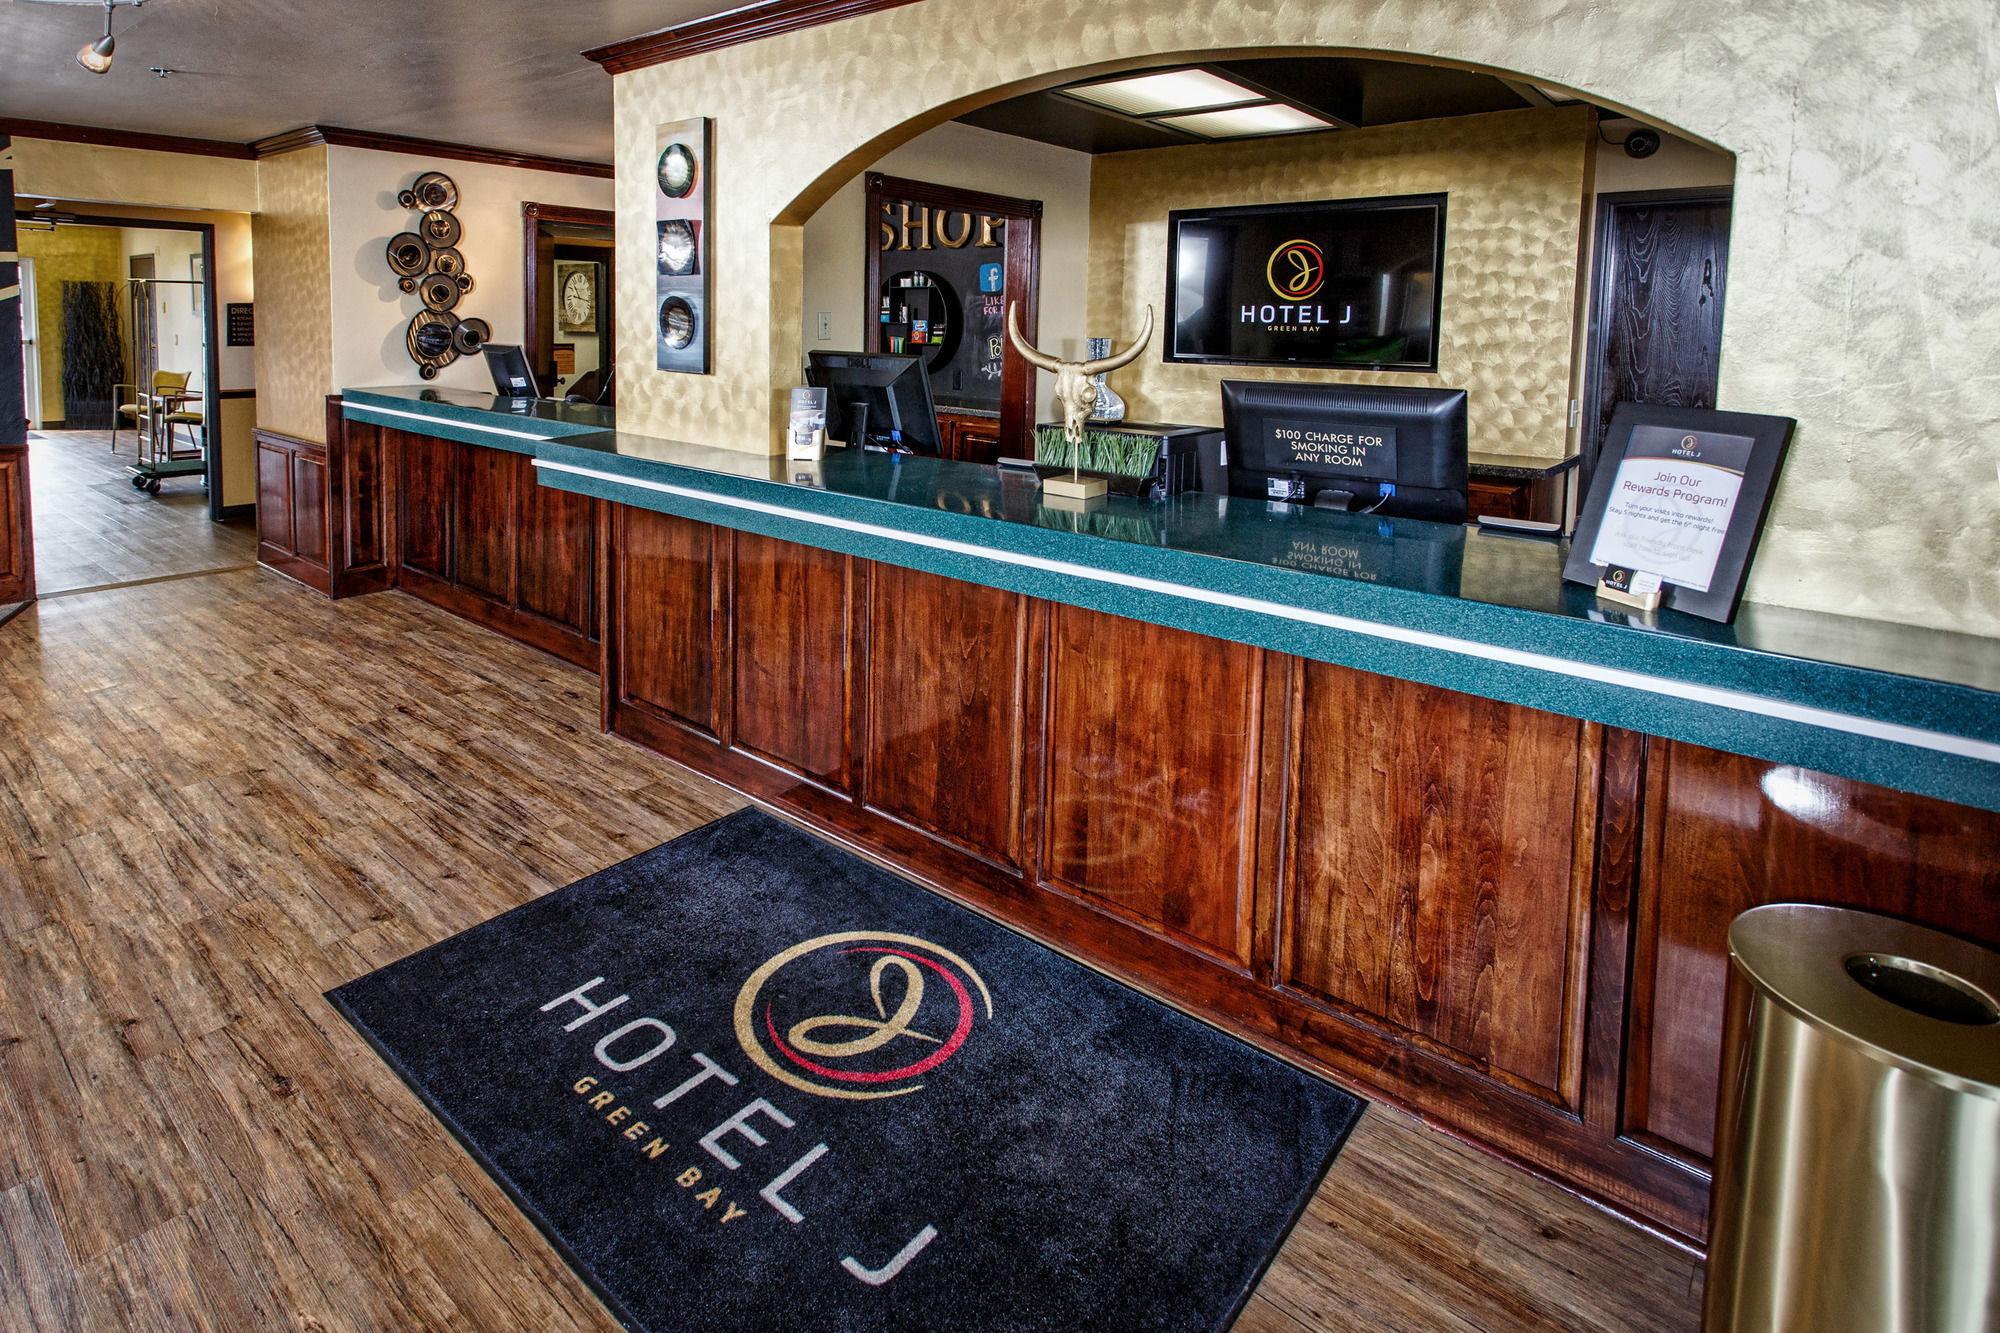 Airport Settle Inn in Green Bay, WI